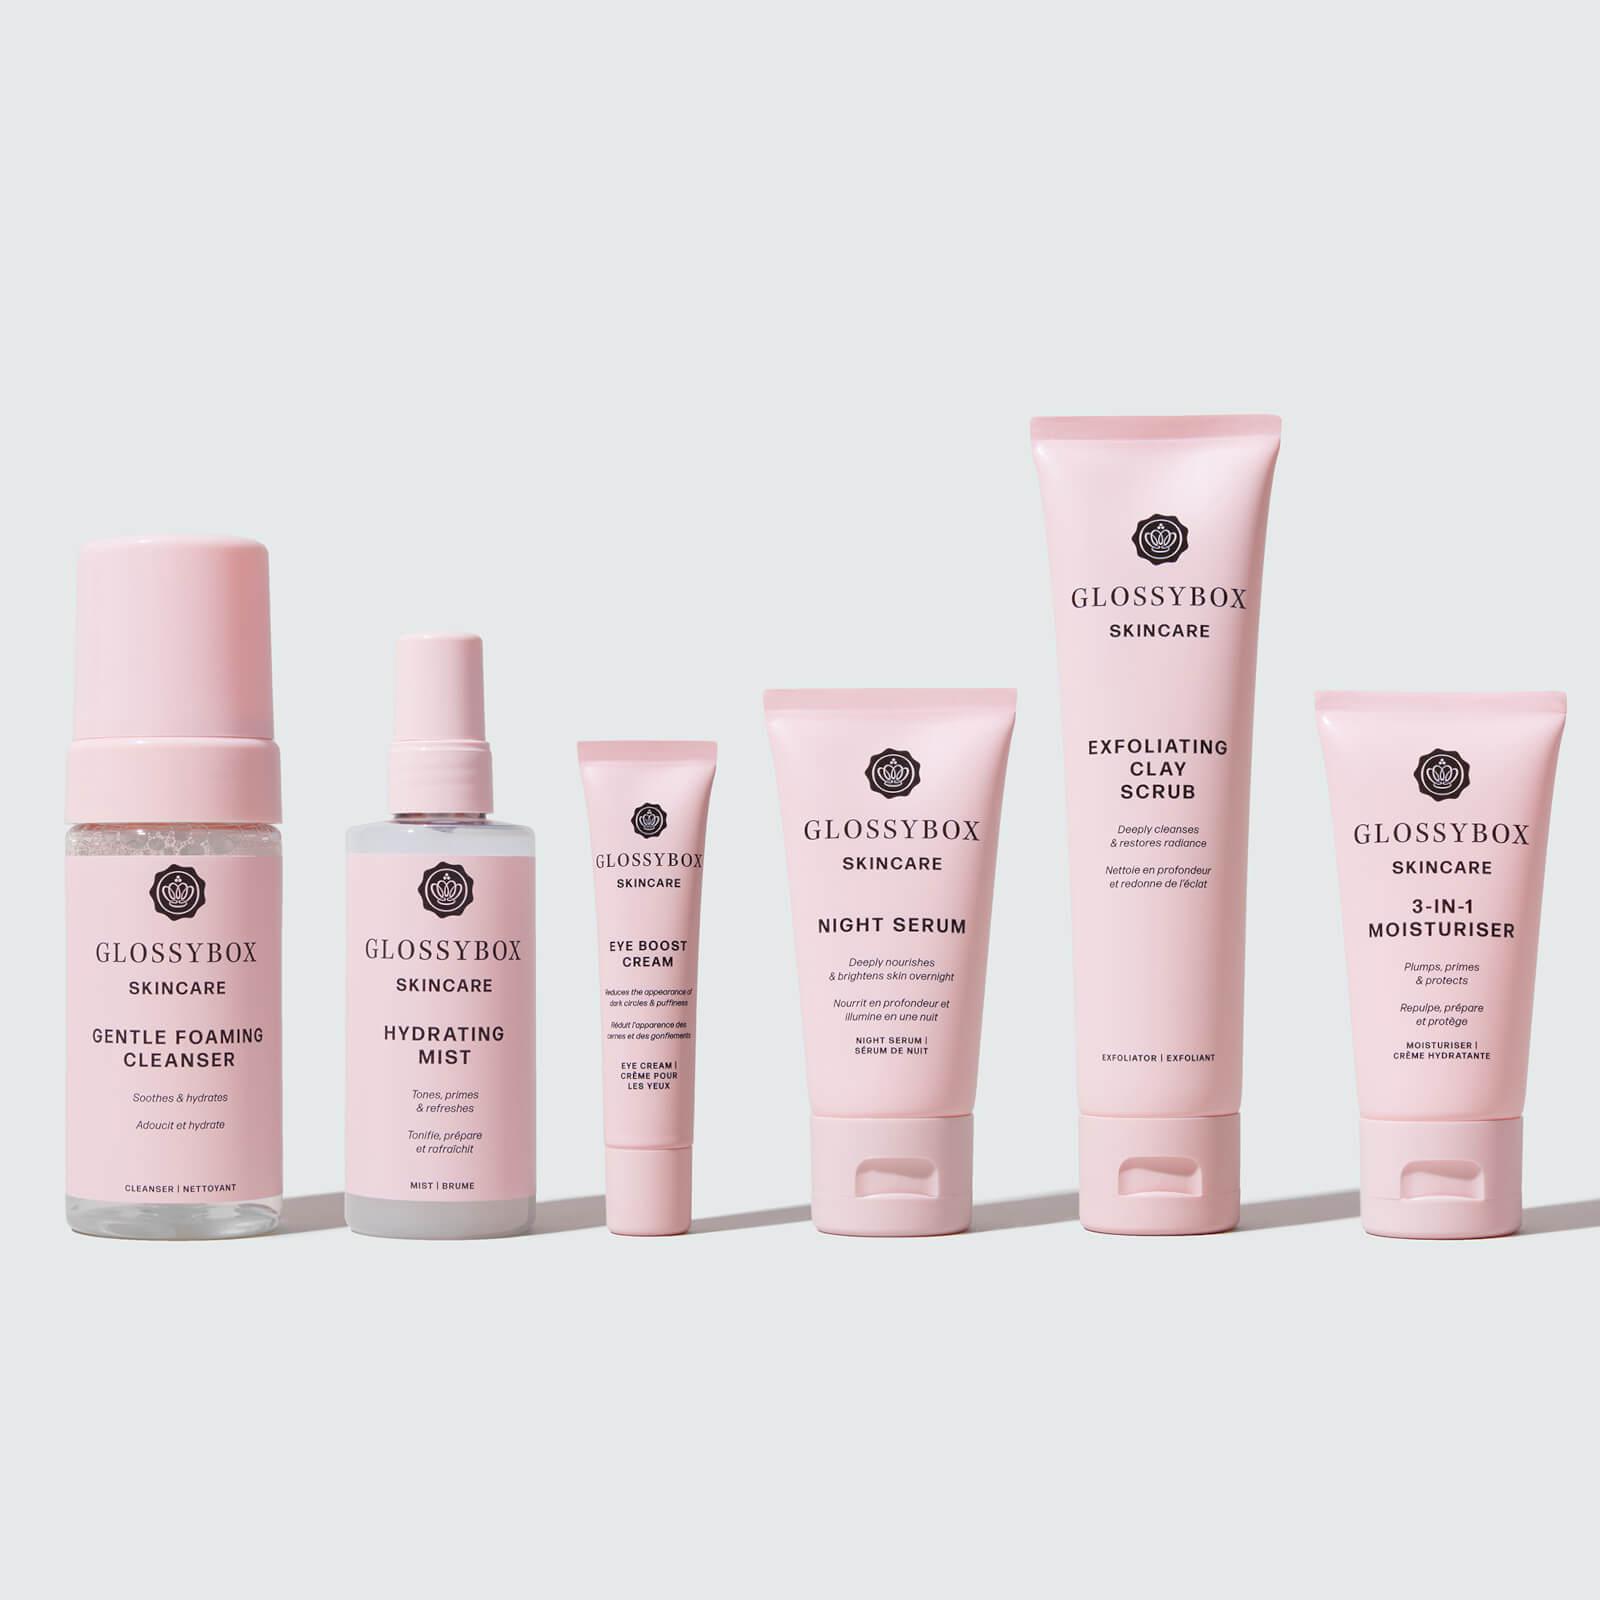 Glossy Box coupon: GLOSSYBOX Skincare Sensitive Skin Bundle (Worth $128.00)